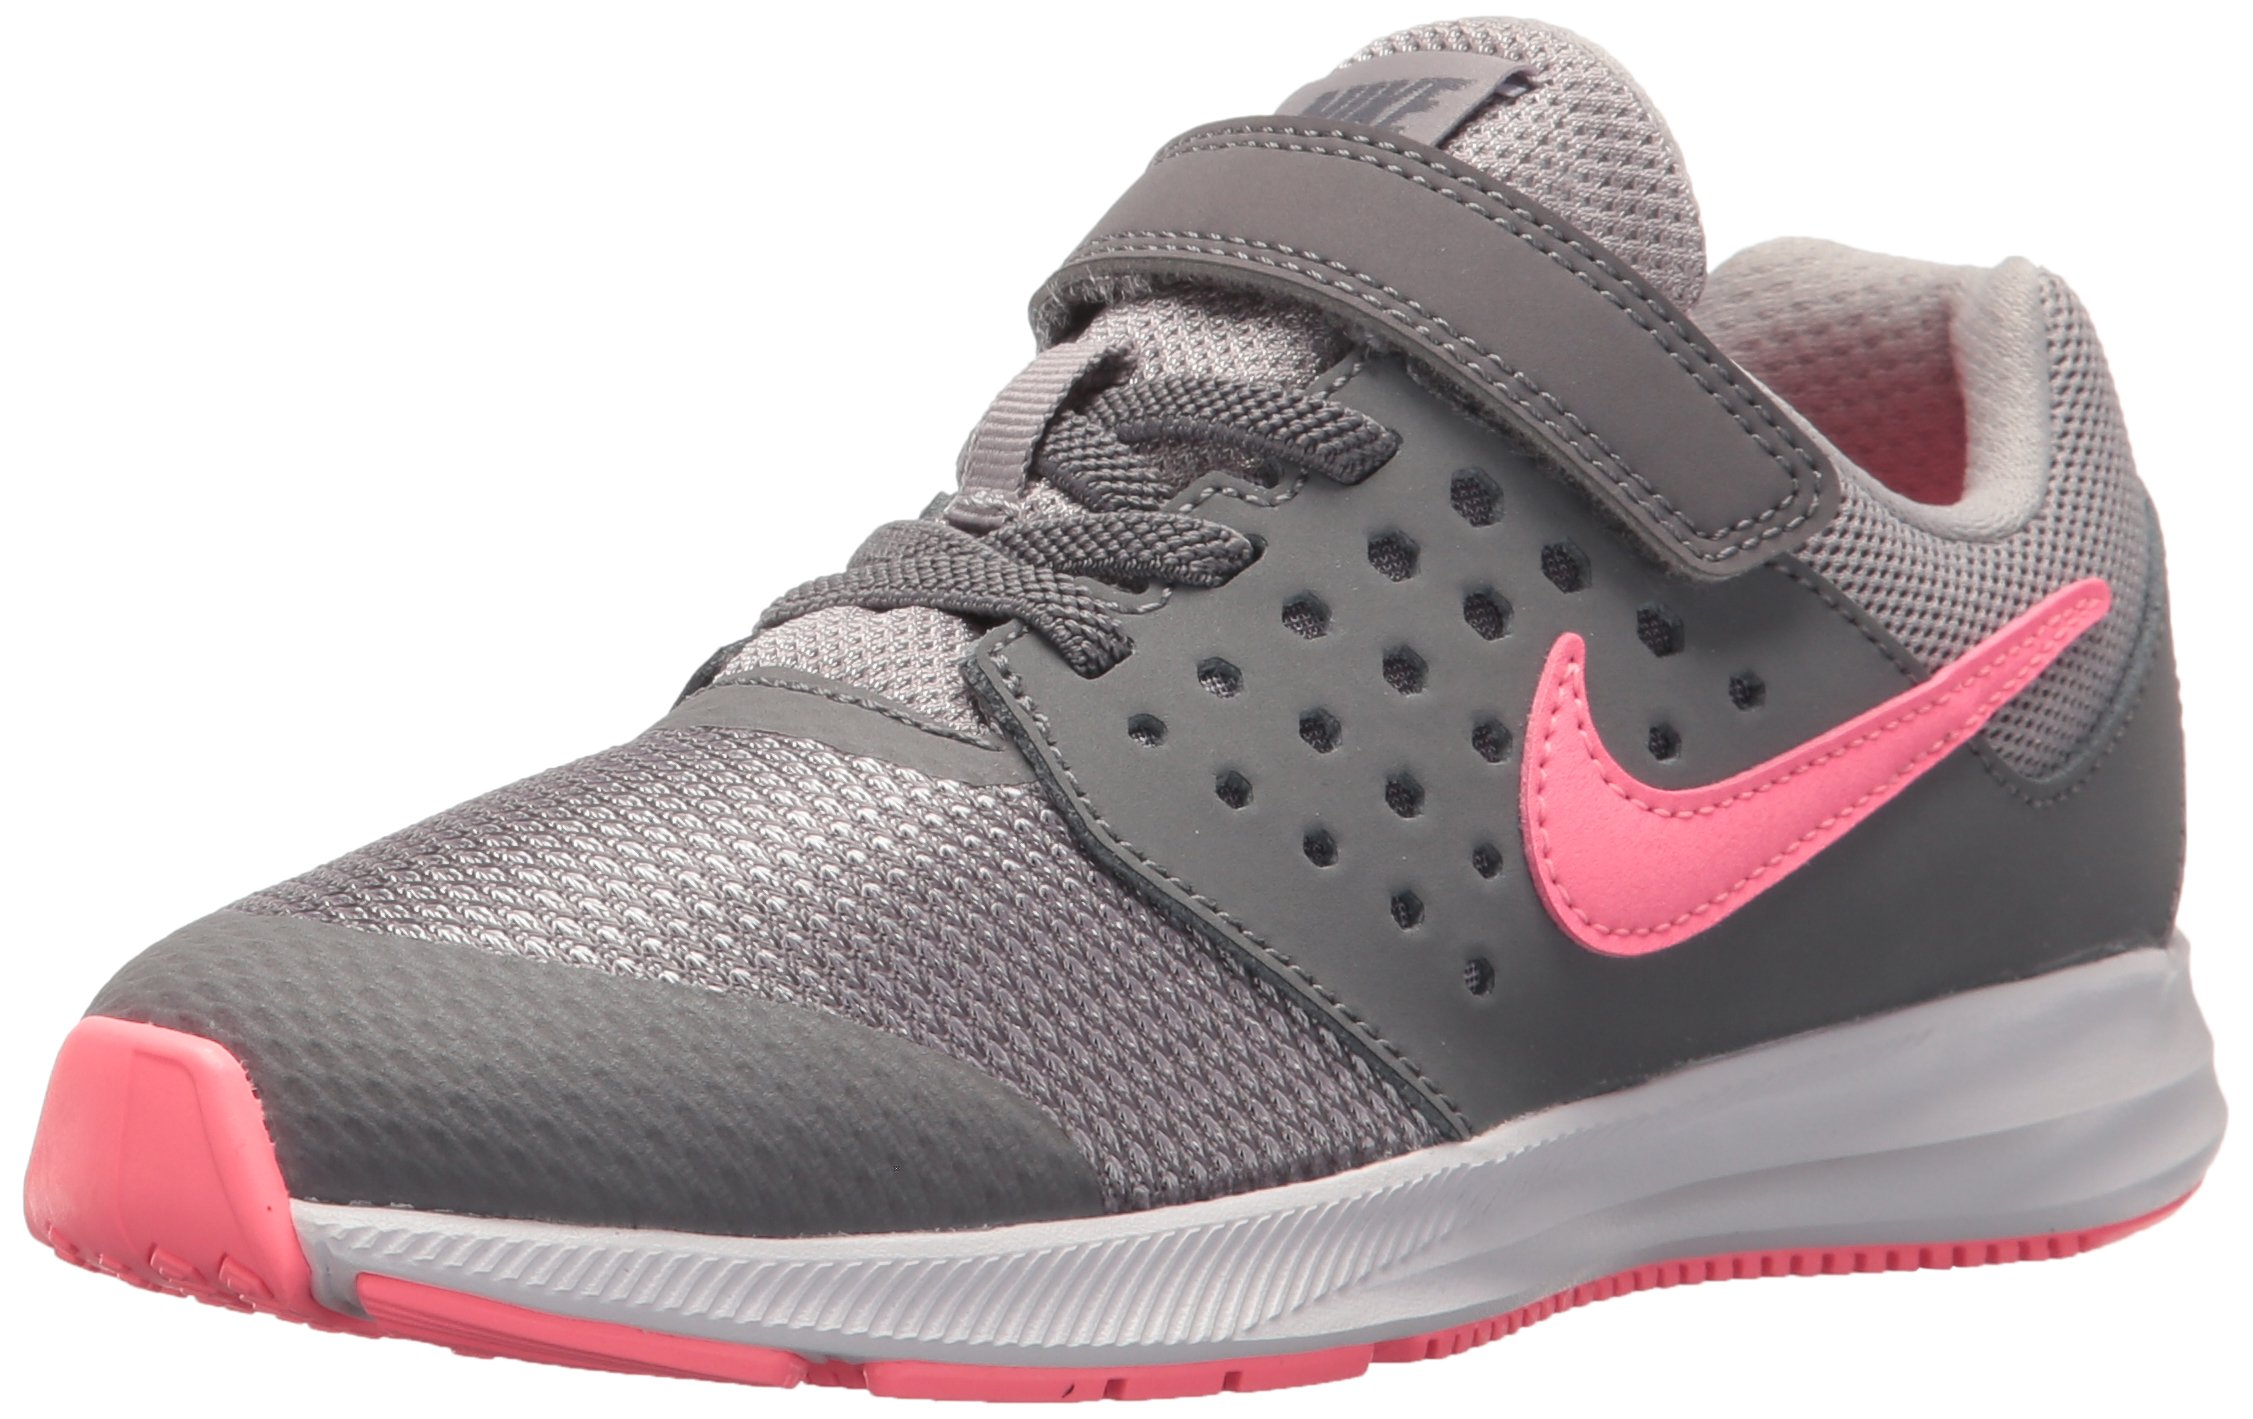 Nike Girls' Downshifter 7 (PSV) Running Shoe Gunsmoke/Sunset Pulse - Atmosphere Grey 1 M US Little Kid